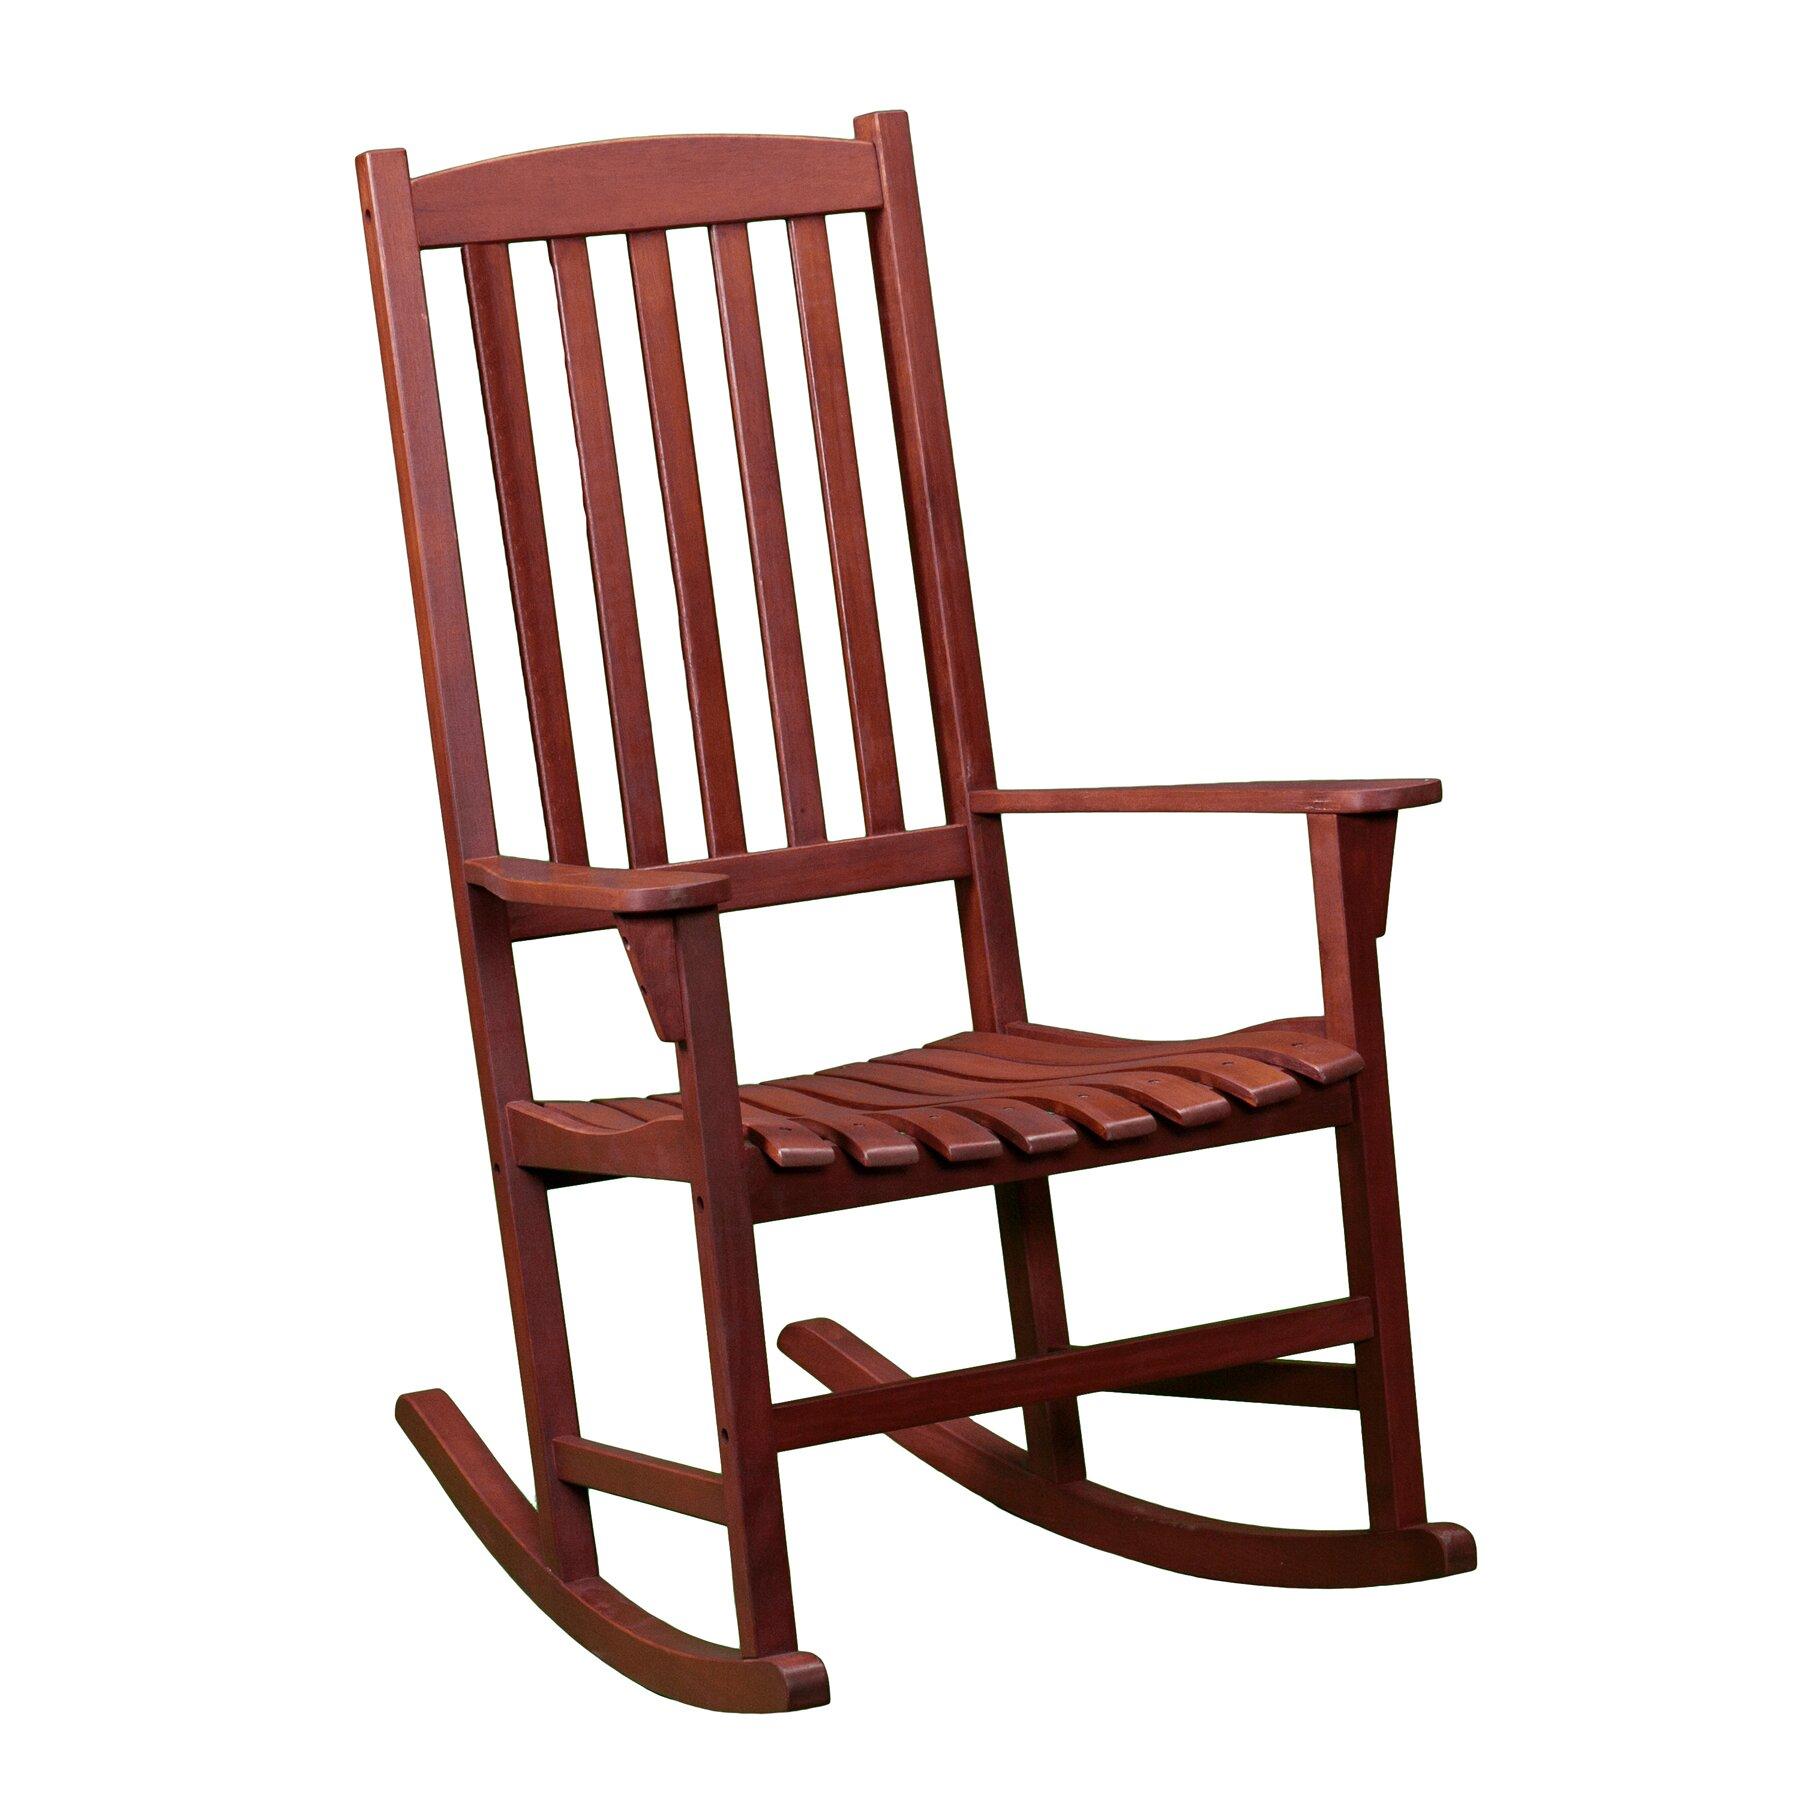 Wildon Home ® Alden Porch Rocking Chair & Reviews  Wayfair